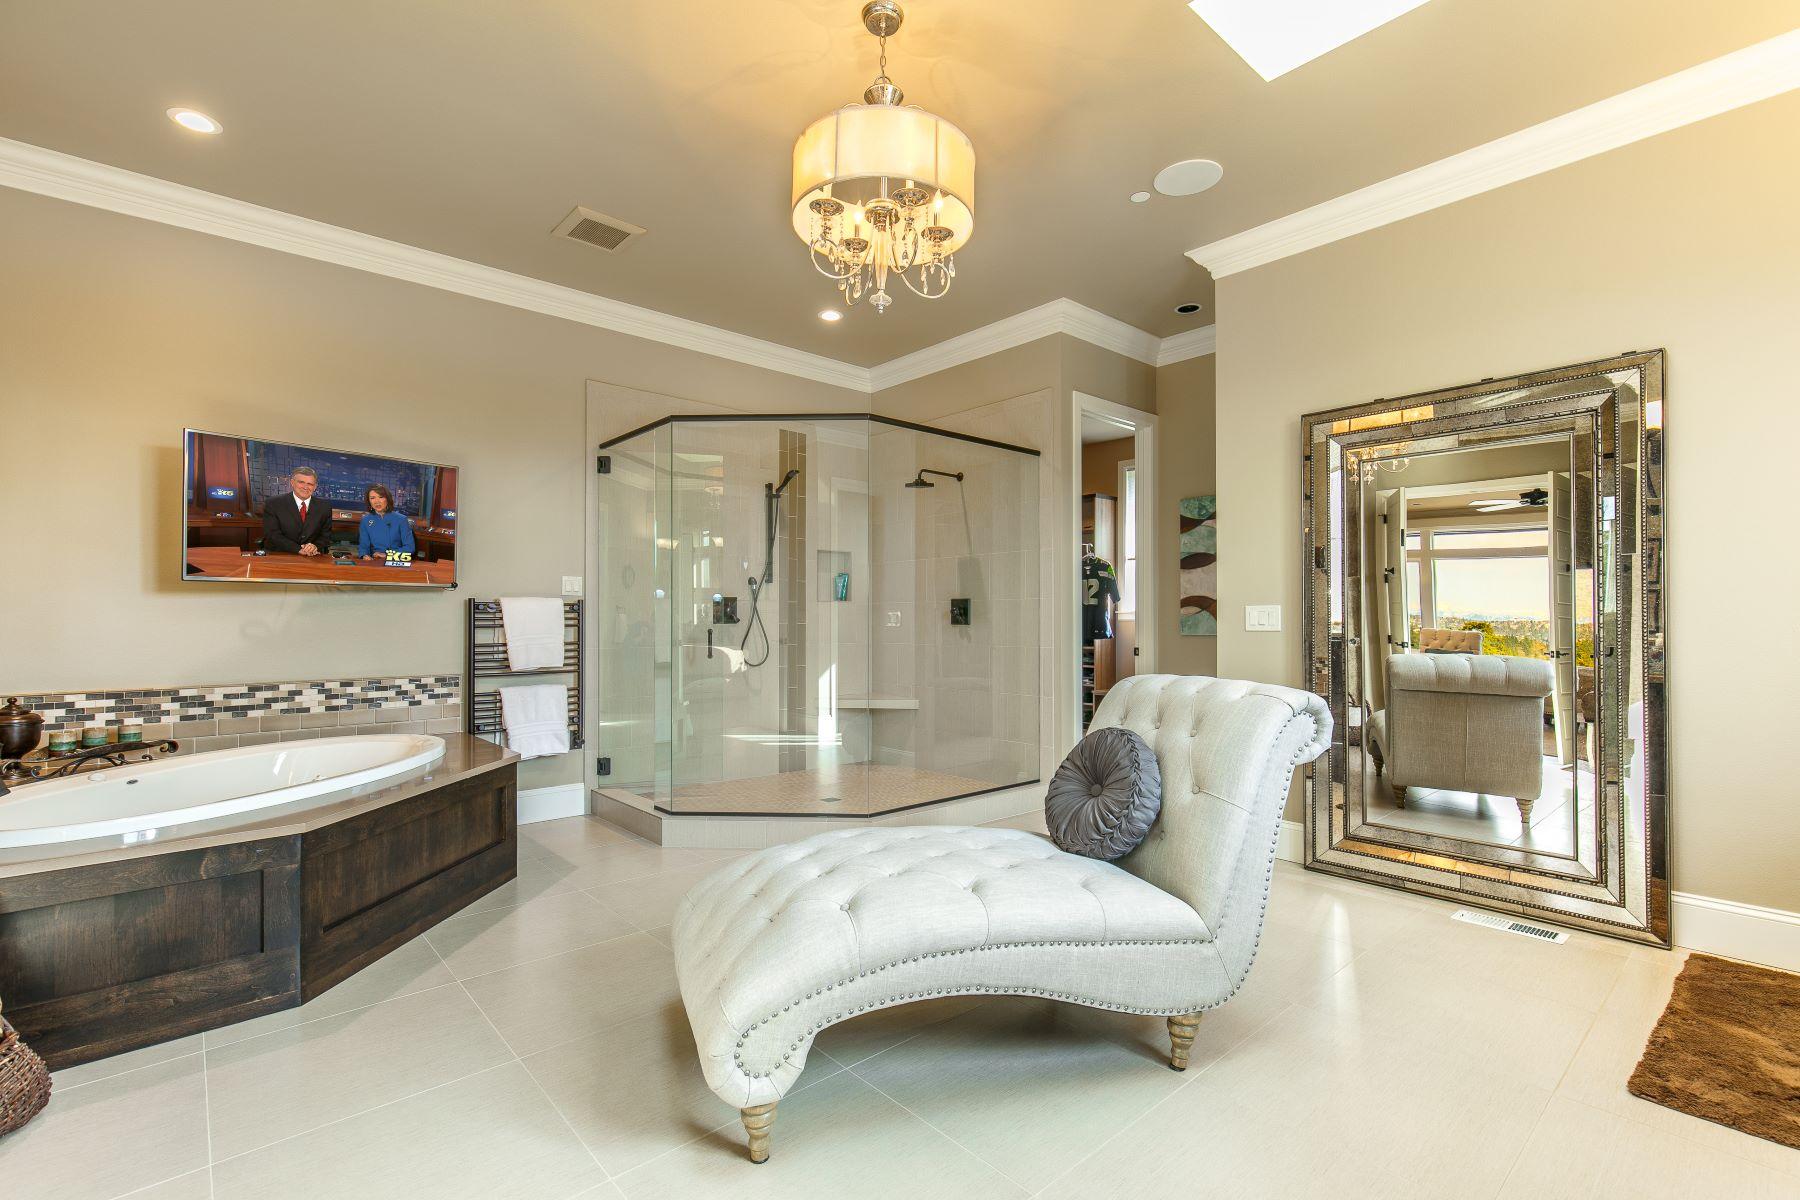 Additional photo for property listing at Exquisite Vuecrest Estate 9368 Vineyard Crst Bellevue, Washington 98004 United States